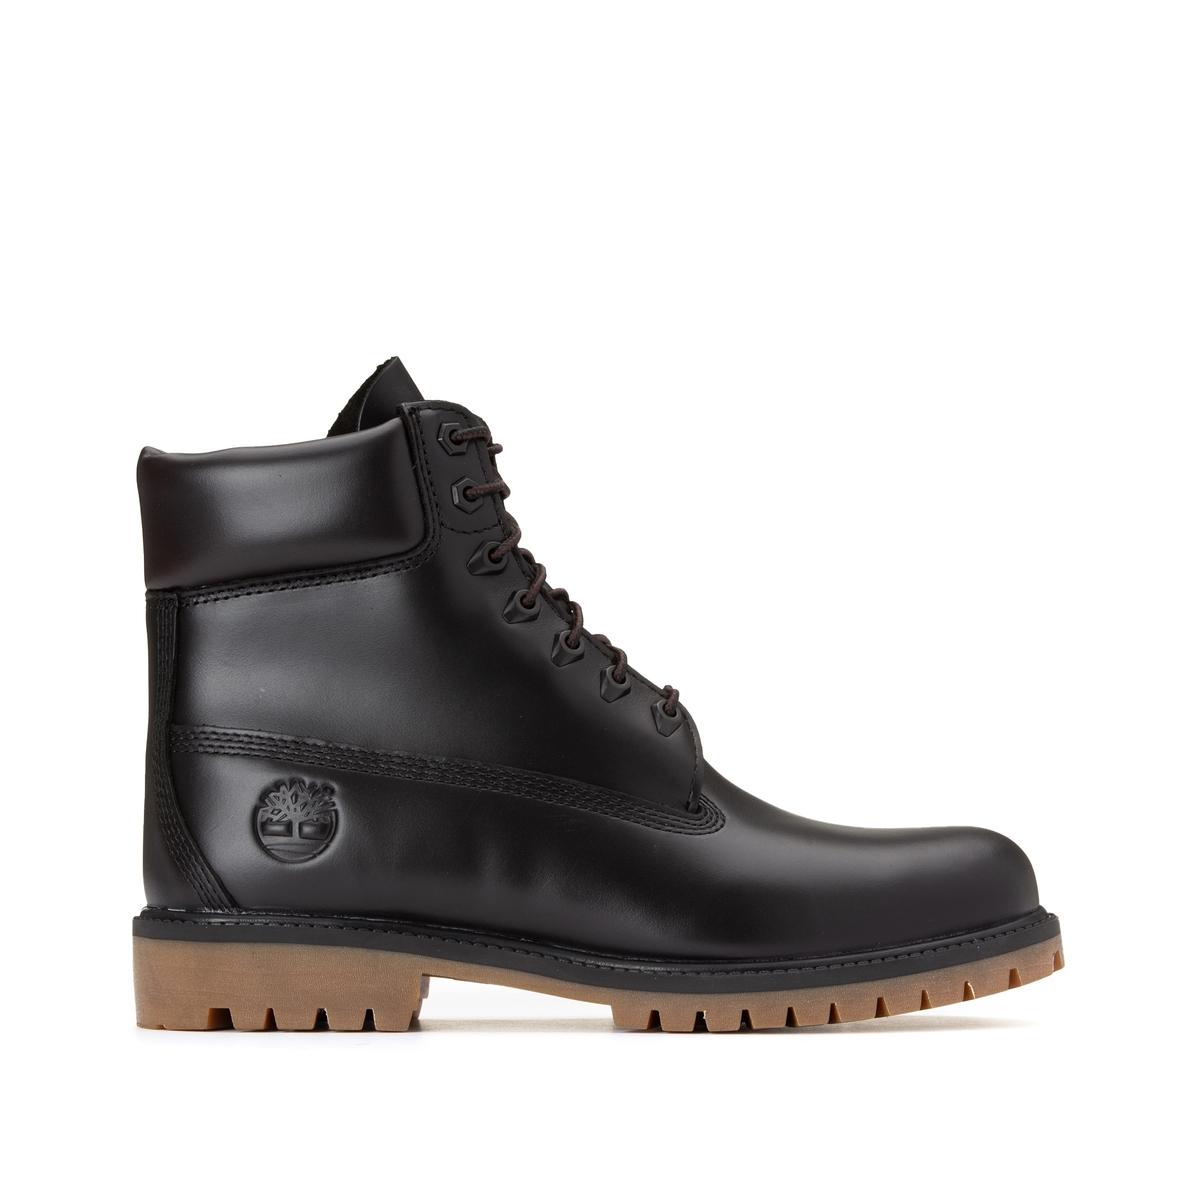 Botines de piel 6 Inch Premium Boot